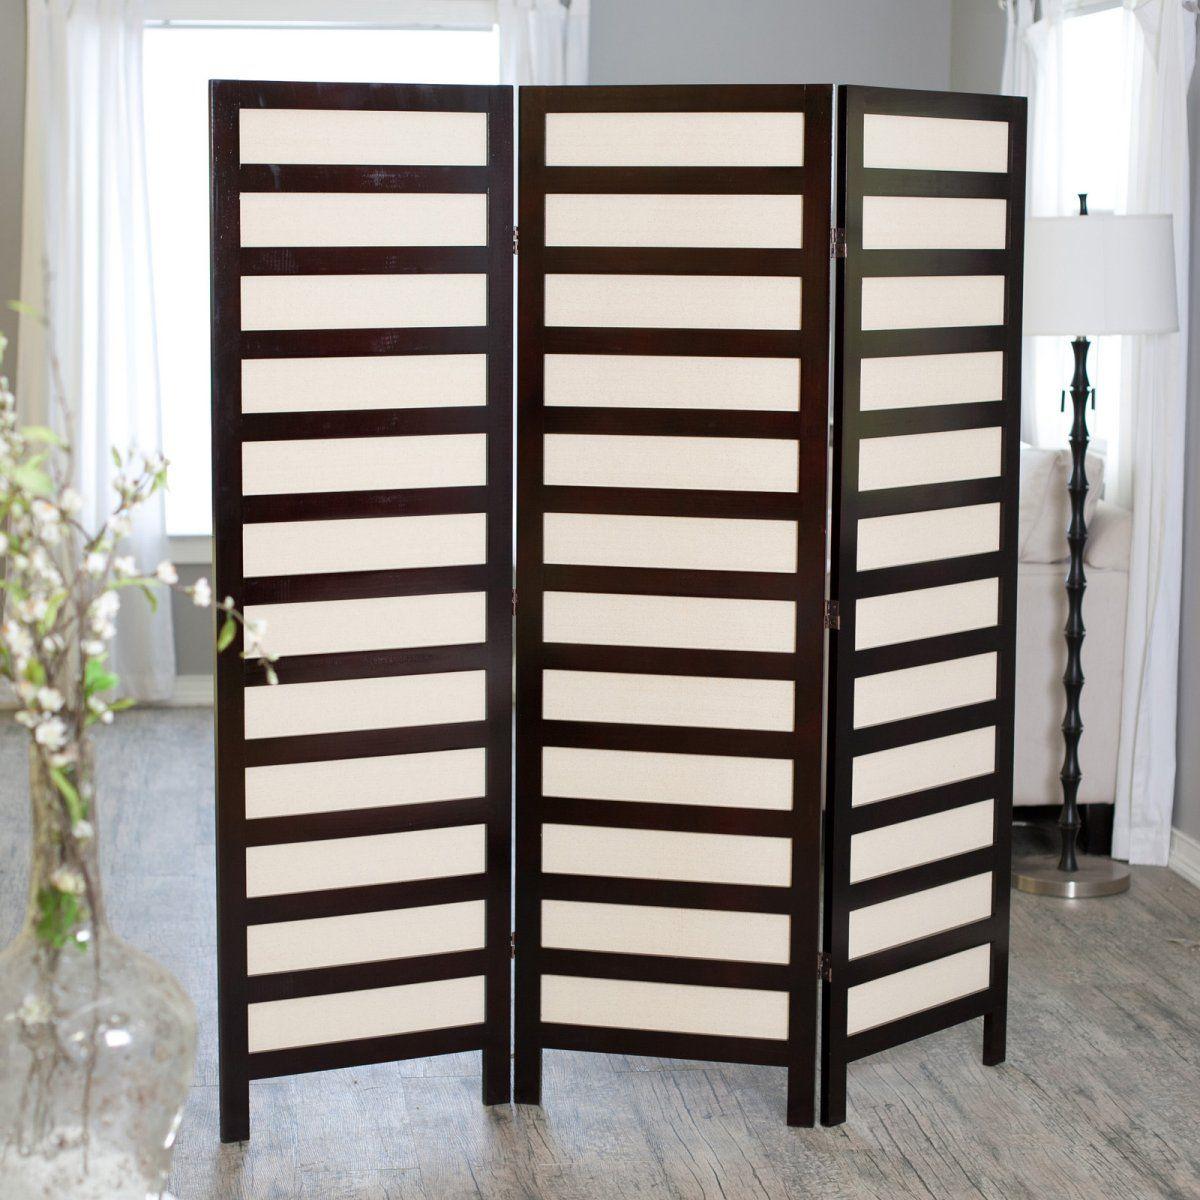 Appealing wooden freestanding folding room divider idea in espresso